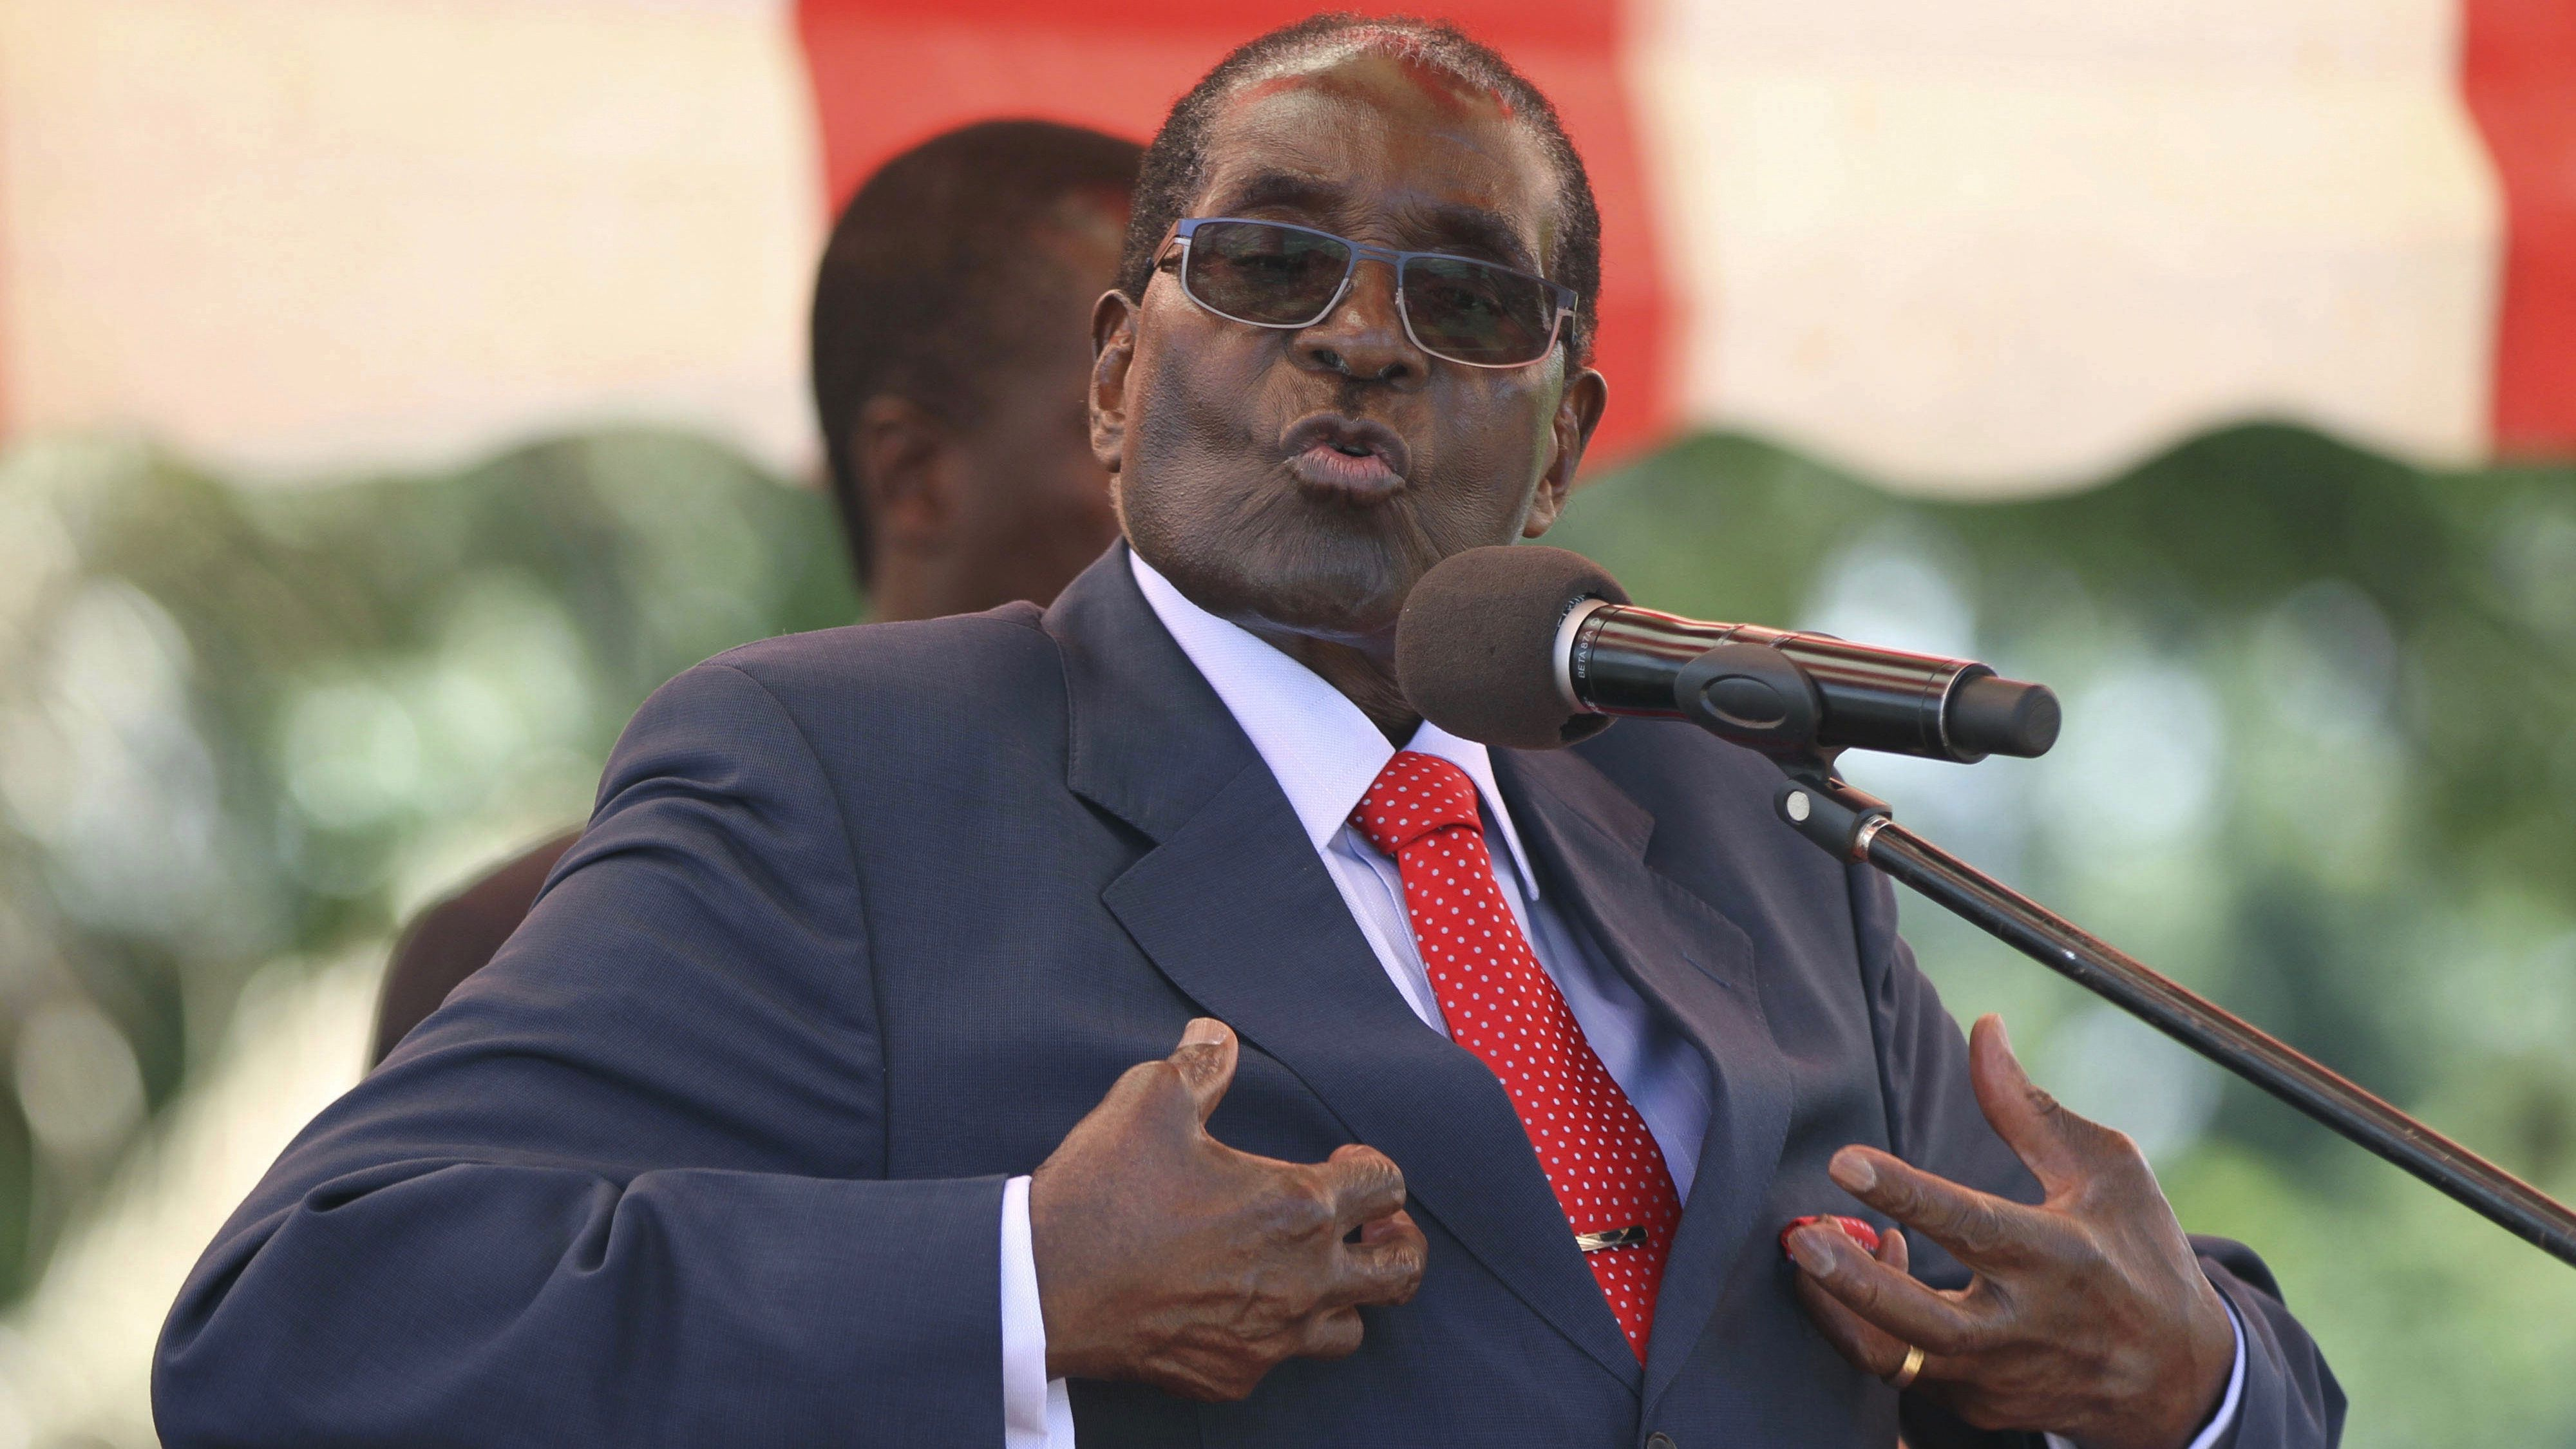 2017 in politics, robert mugabe steps down